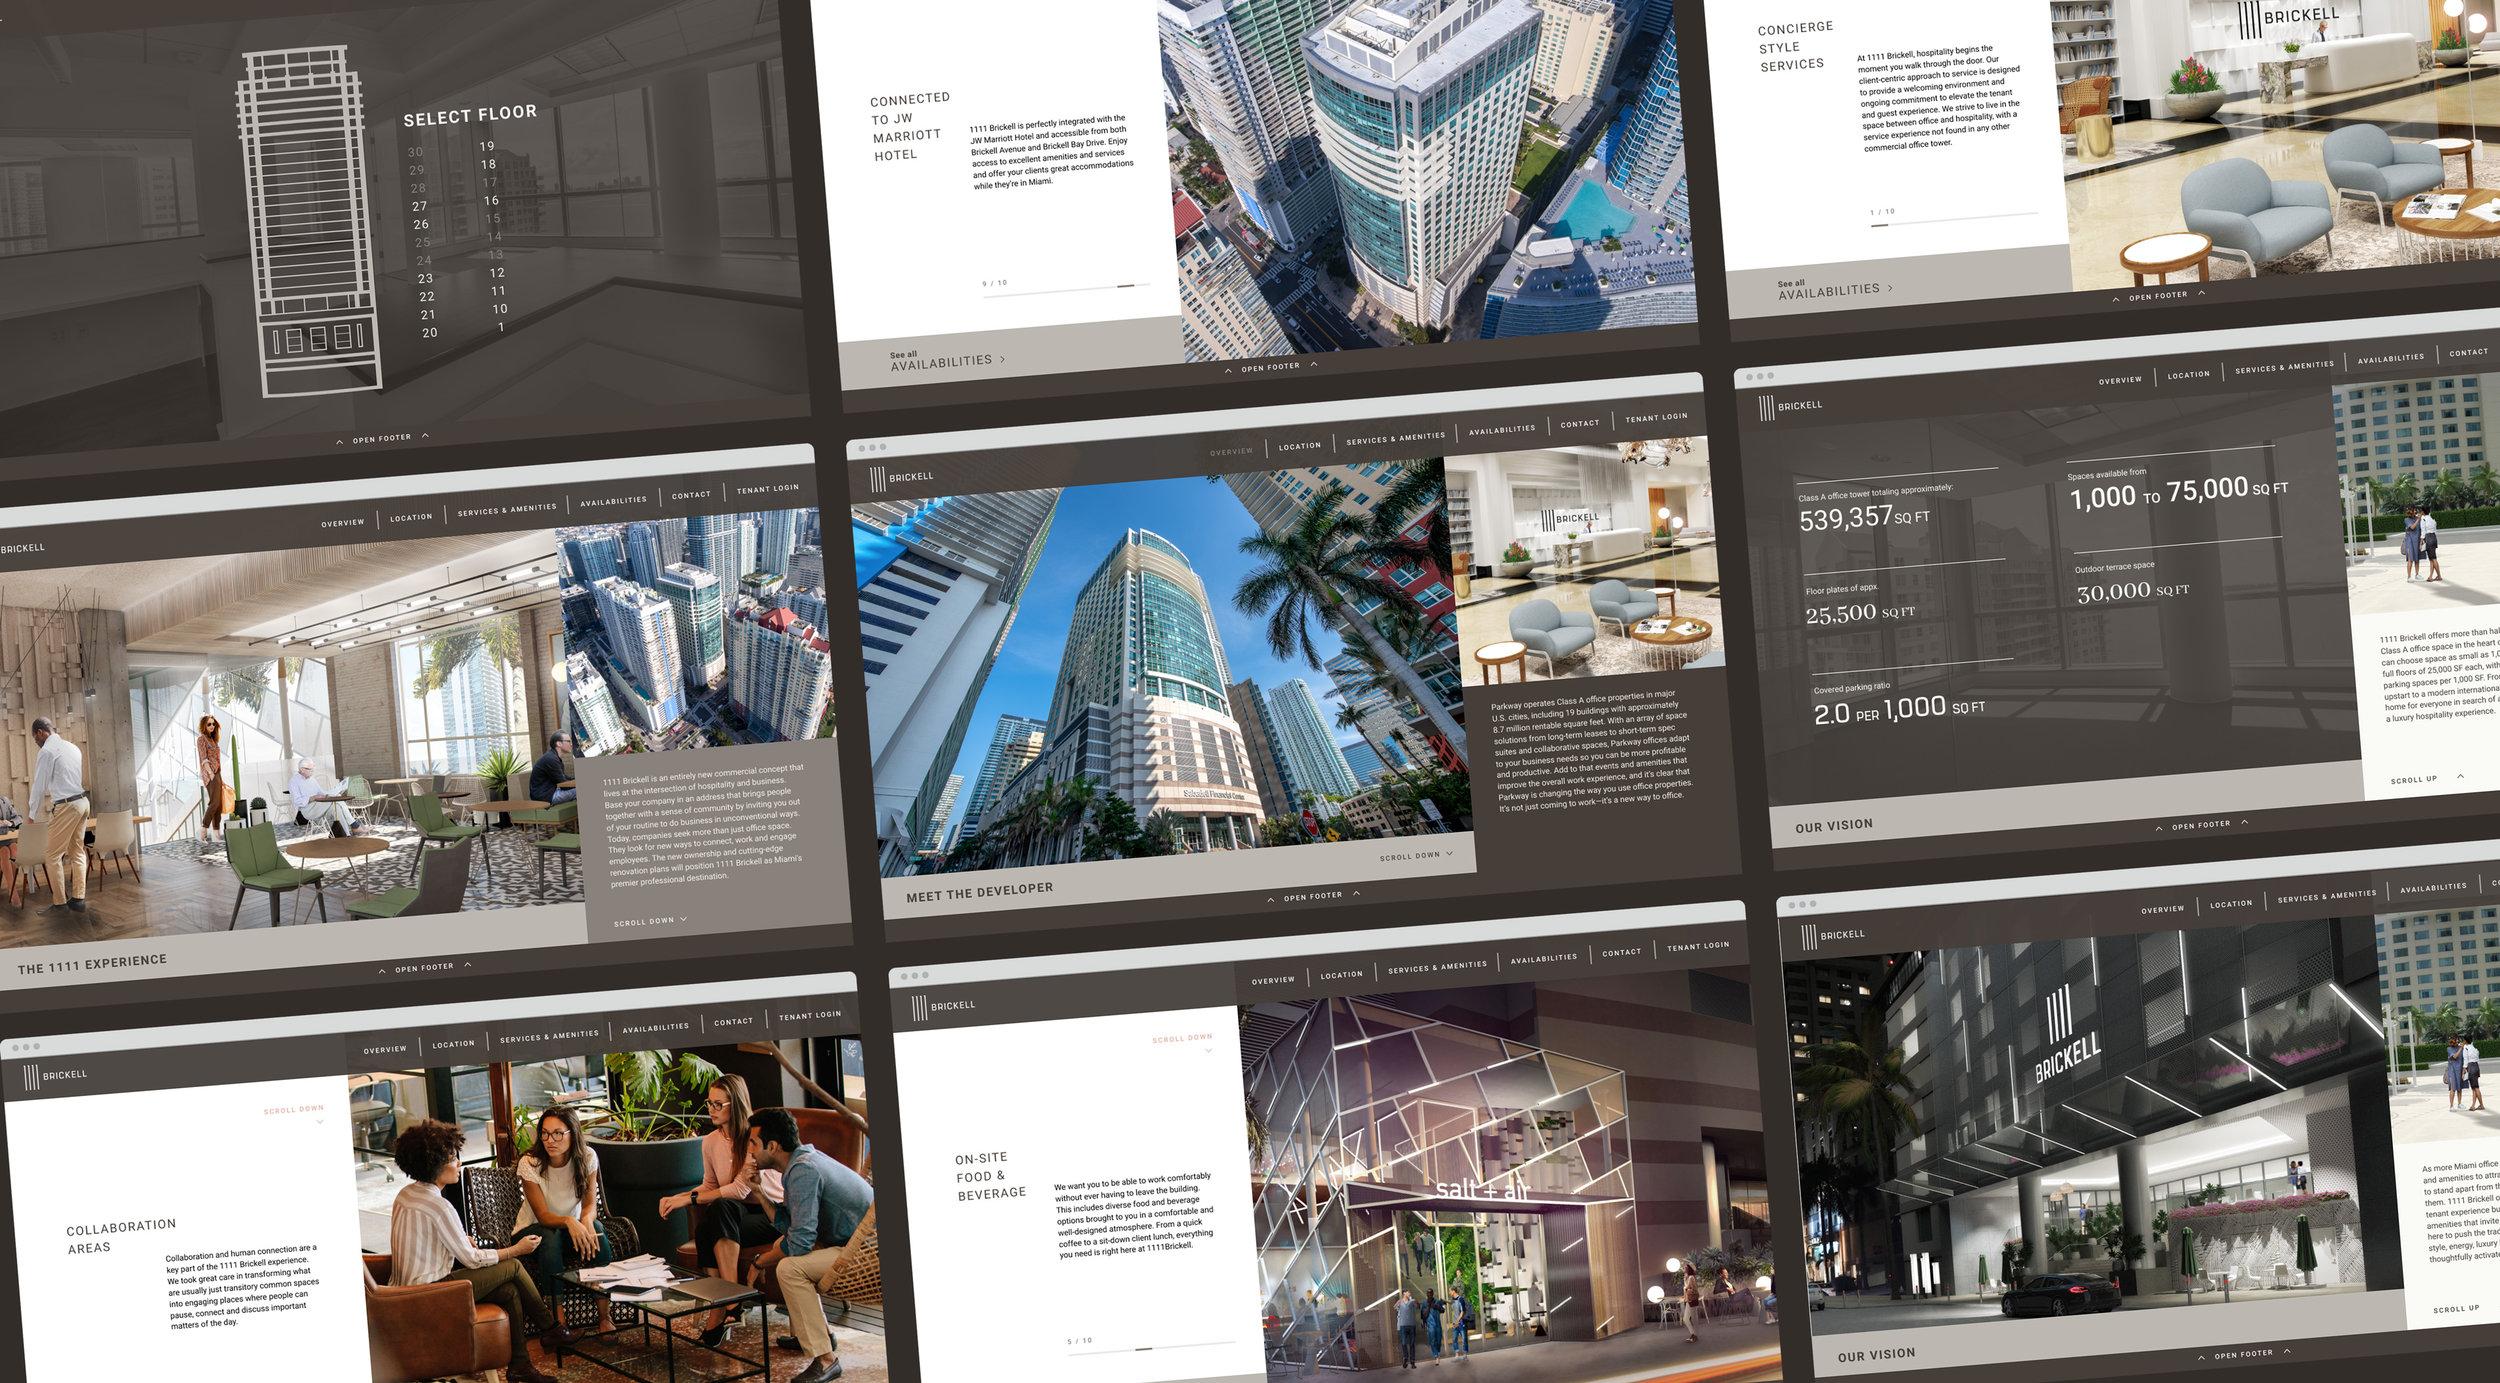 Ana-Juan-Gomez-1111-web-design.jpg